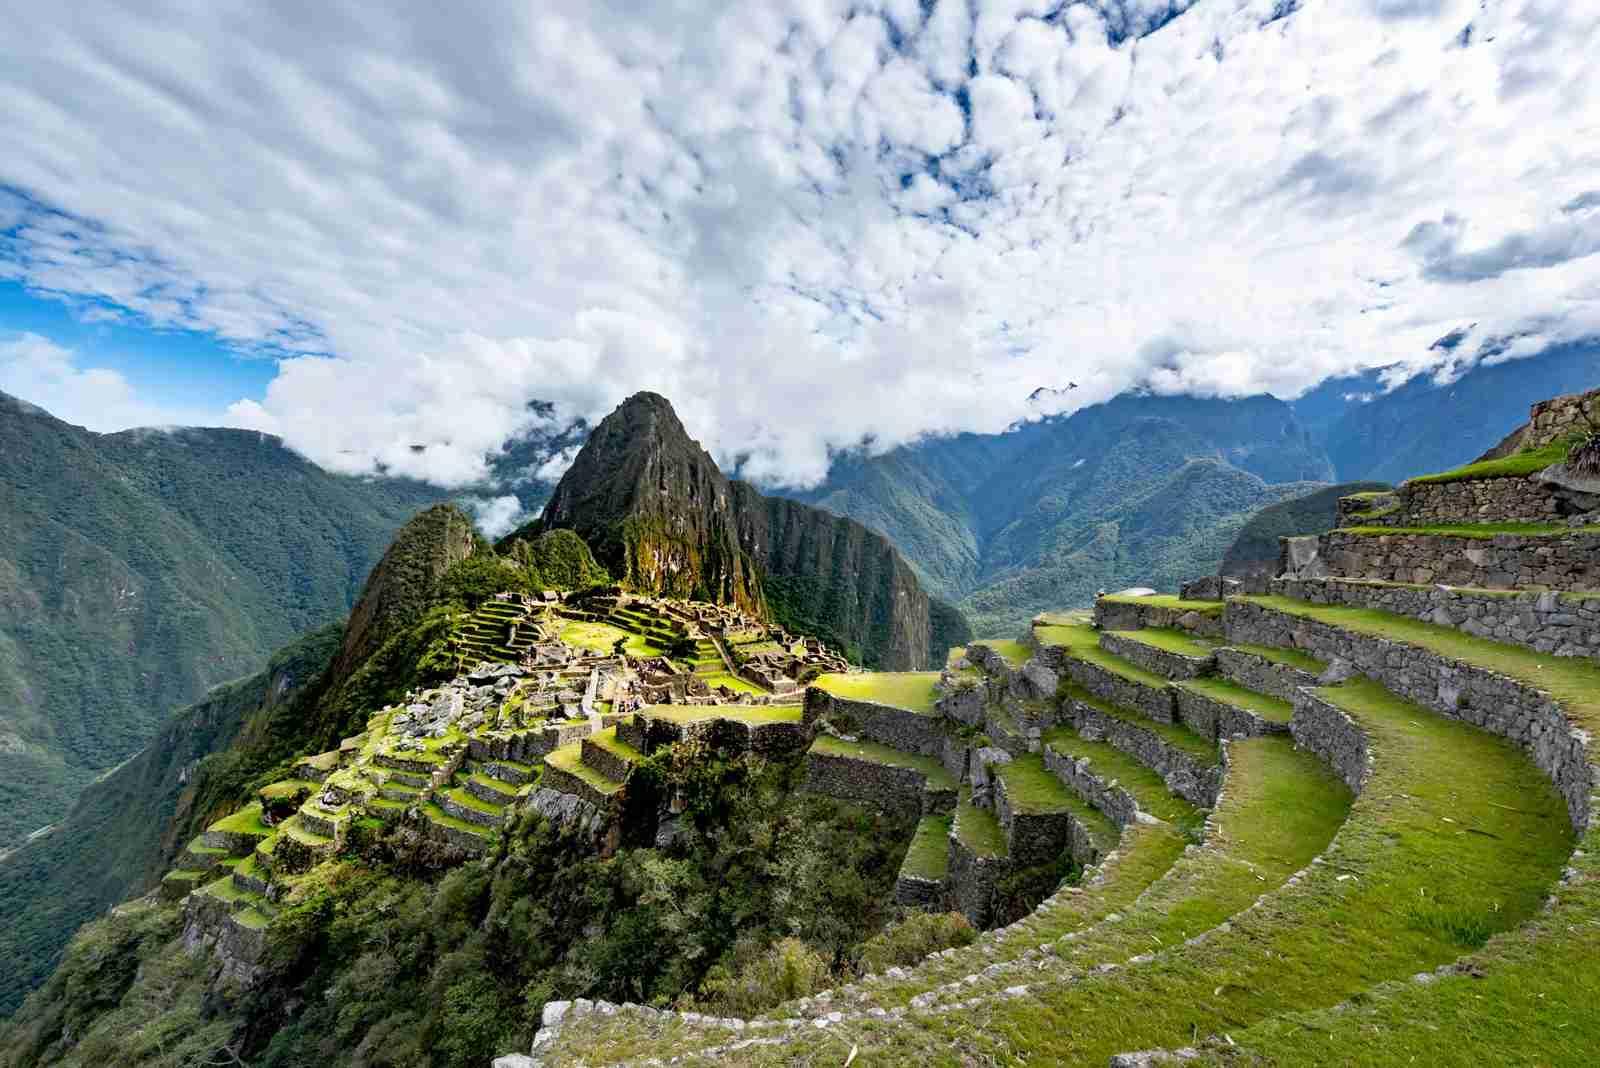 Looking past coronavirus - TPG's Brian Kelly on the future of travel